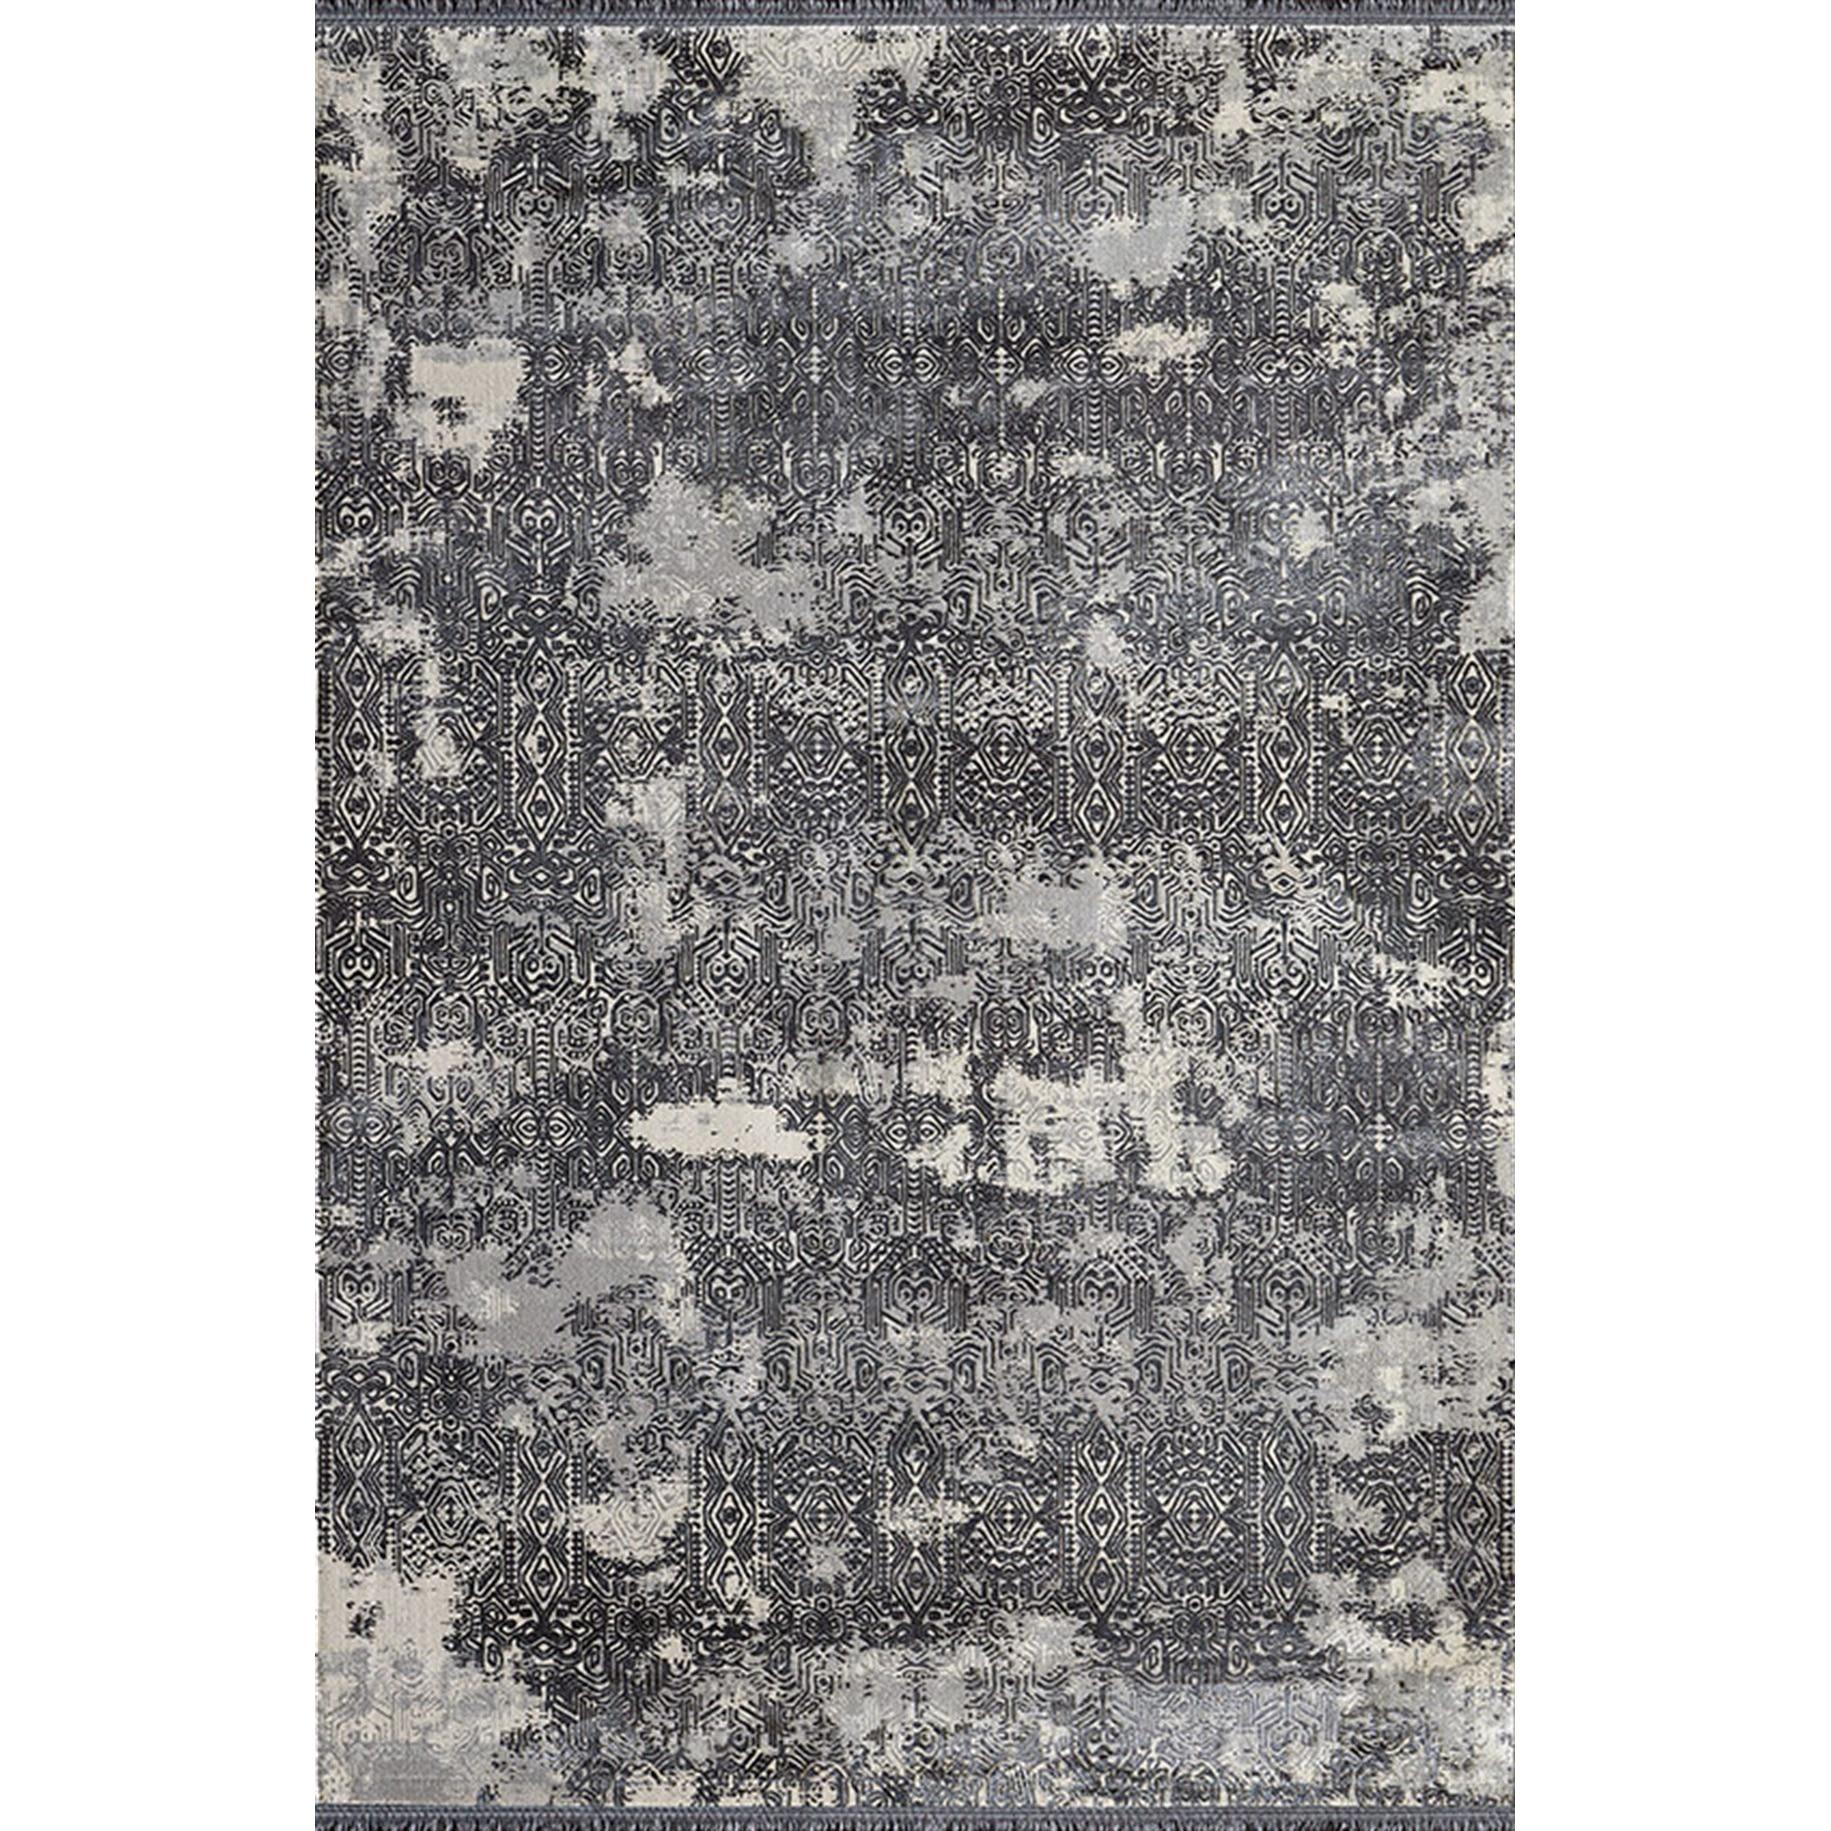 Fotografie Covor Palette Pierre Cardin, antistatic, acrilic, 160x230cm, alb/negru, PA04E